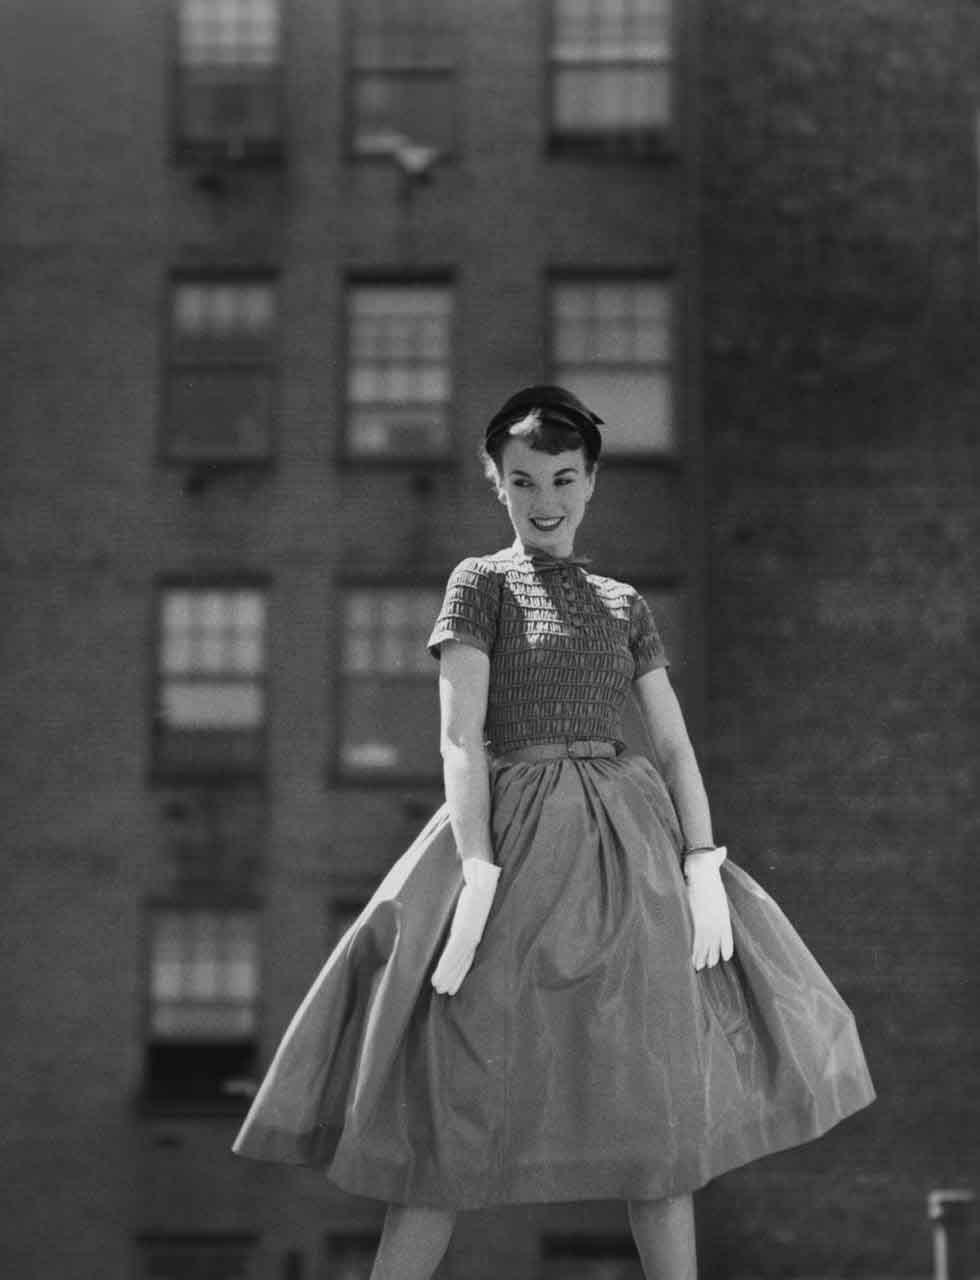 13_55_Model wearing a hat, full dress, and gloves posing on a roof_Dan Wynn Archive 1.jpg